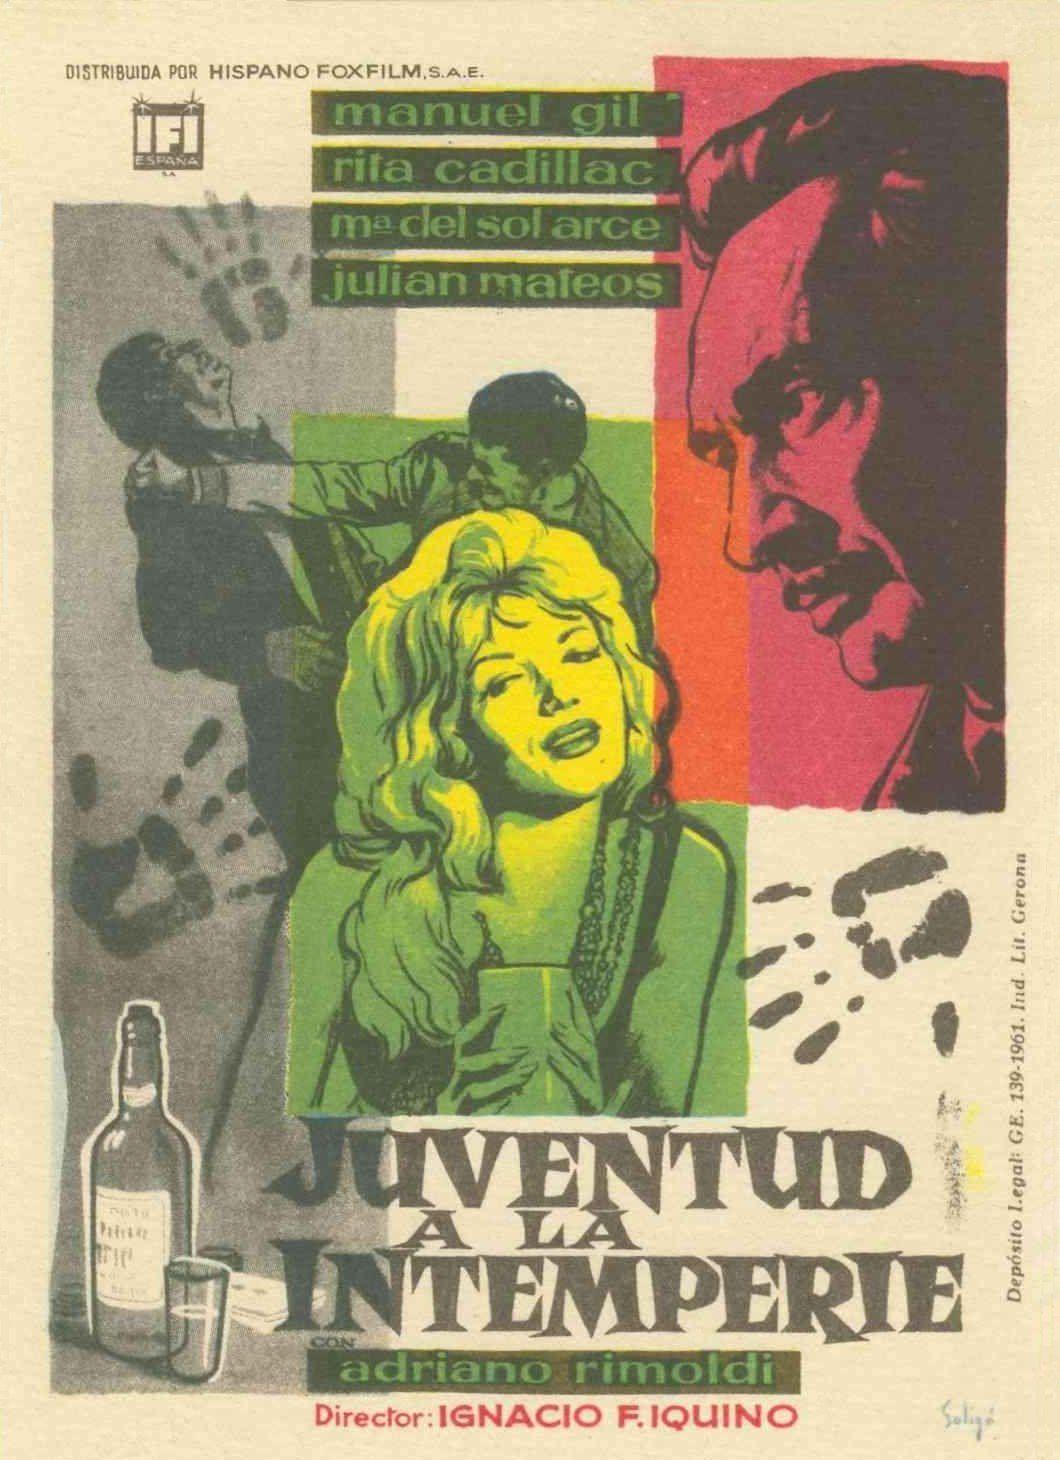 1961 - Juventud a la intemperie